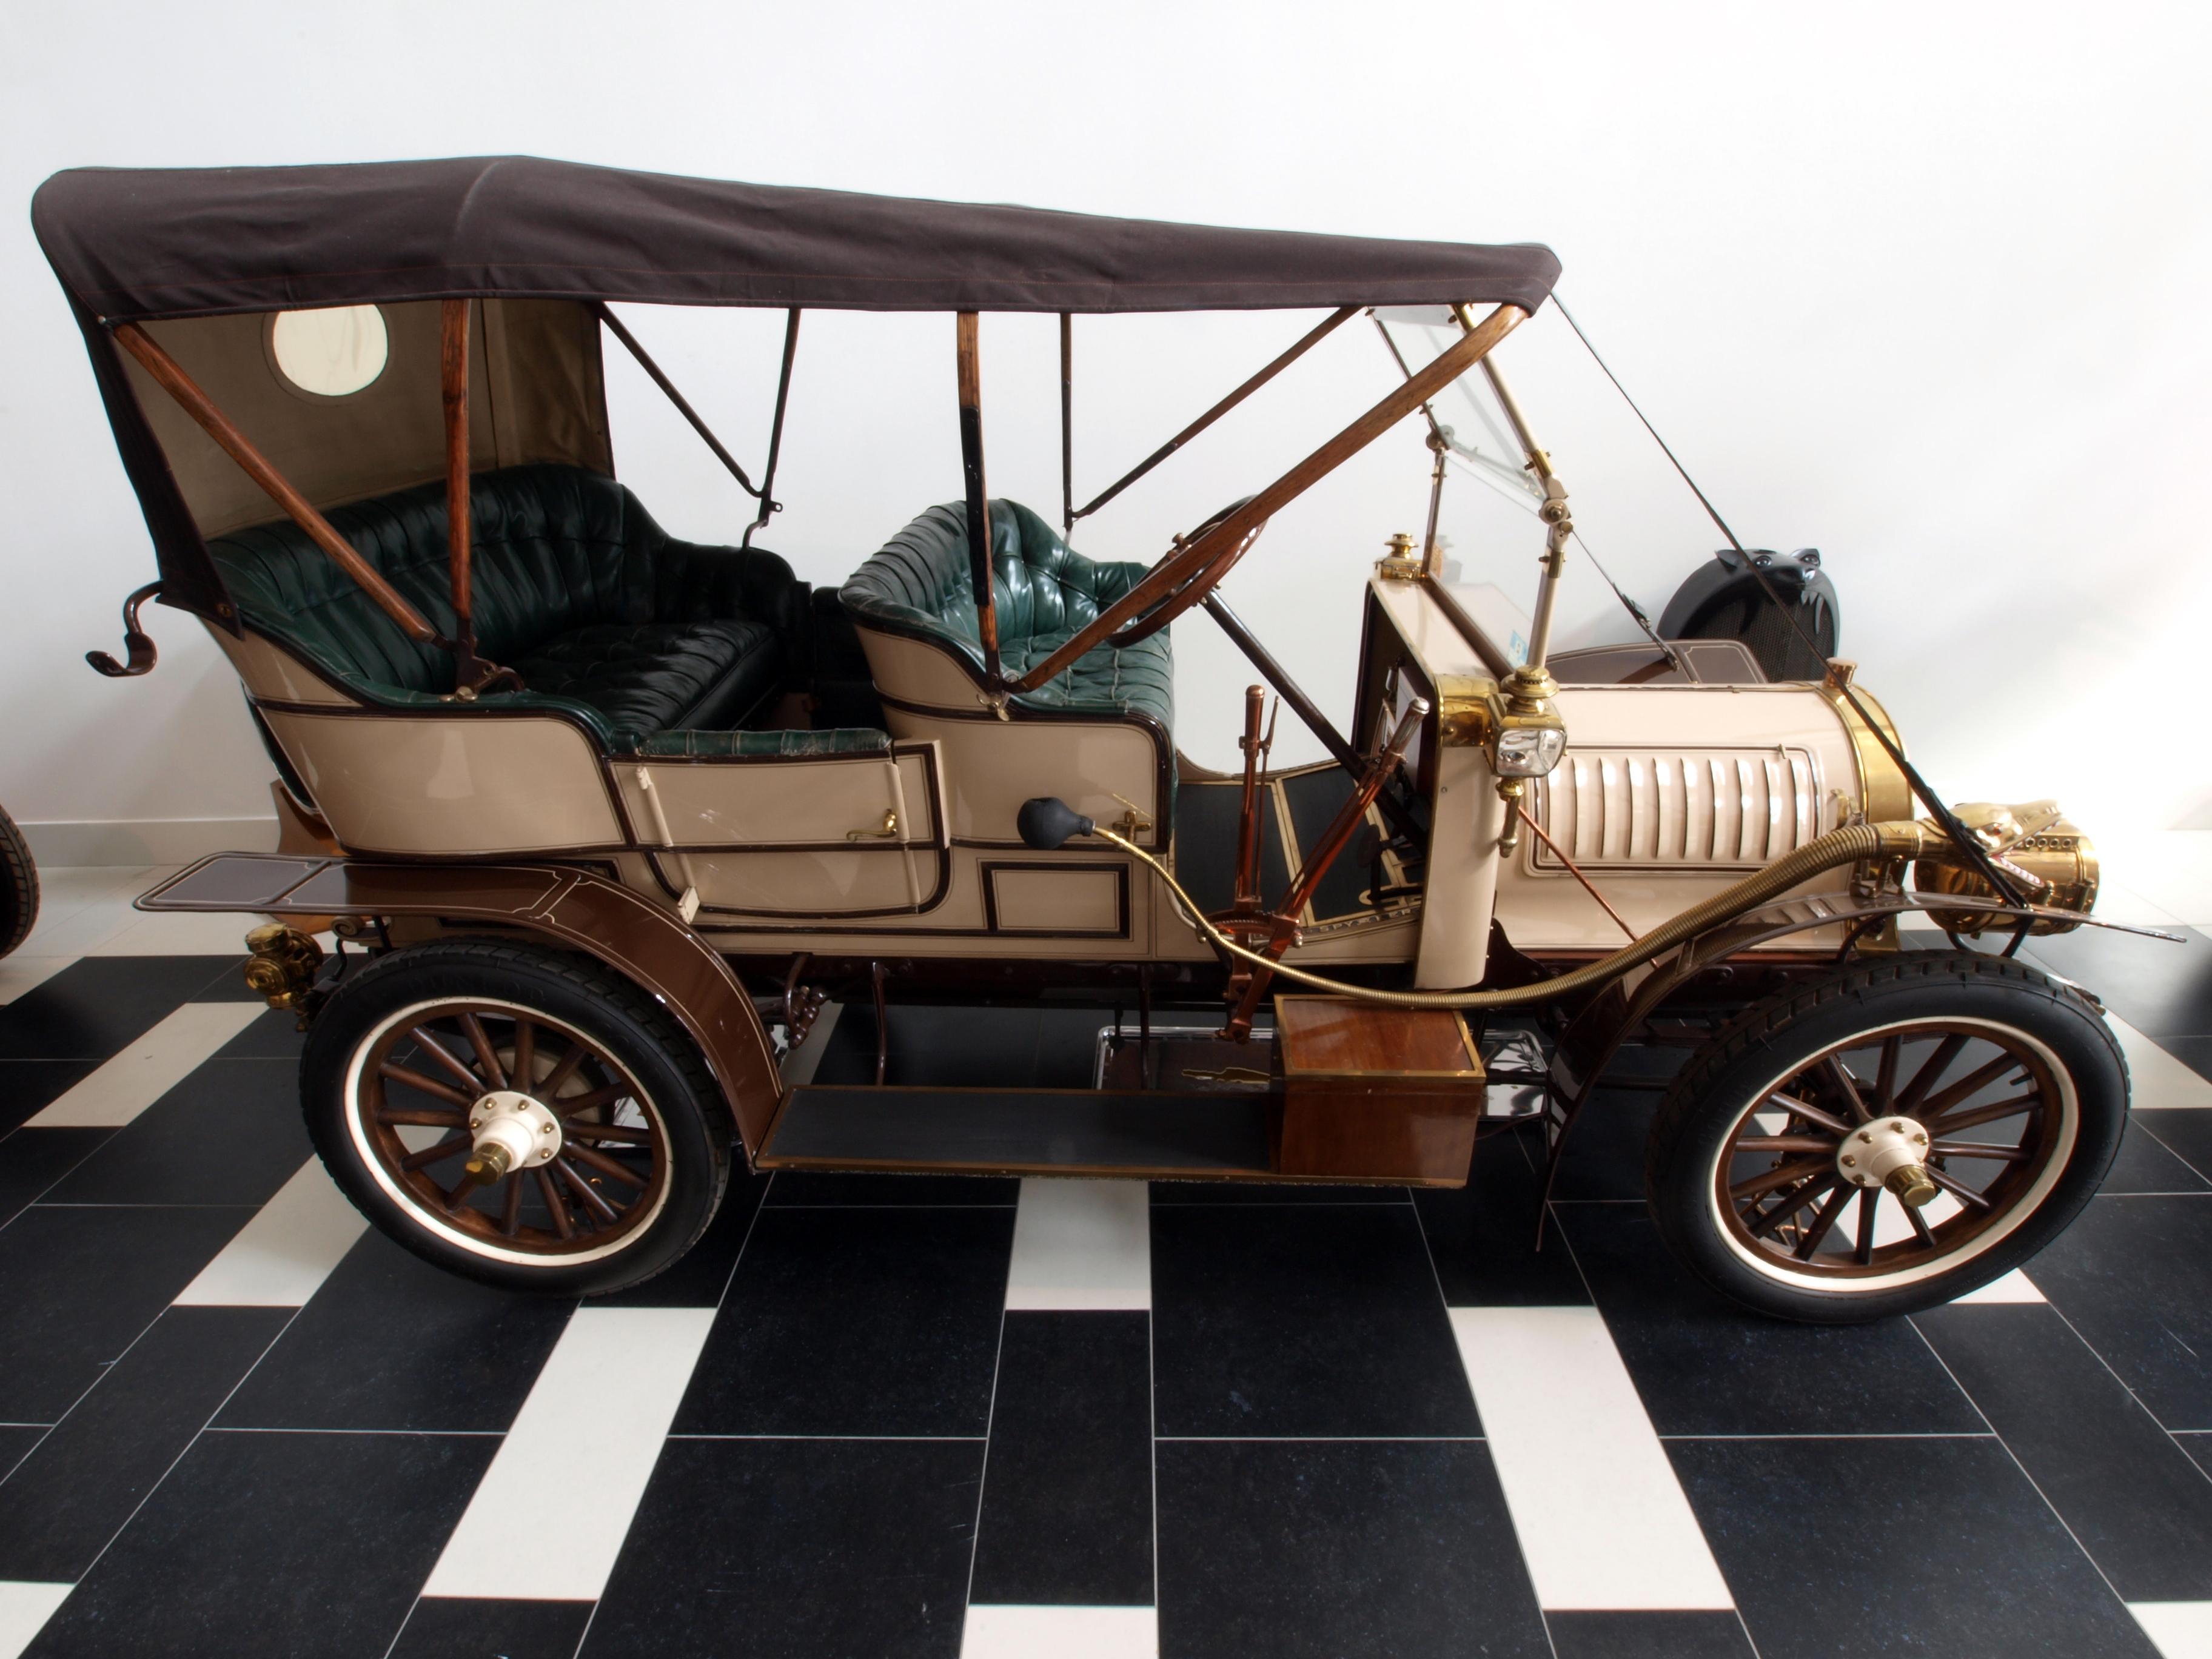 file 1907 spijker 15slash22 hp double phaeton p2 jpg wikimedia commons. Black Bedroom Furniture Sets. Home Design Ideas